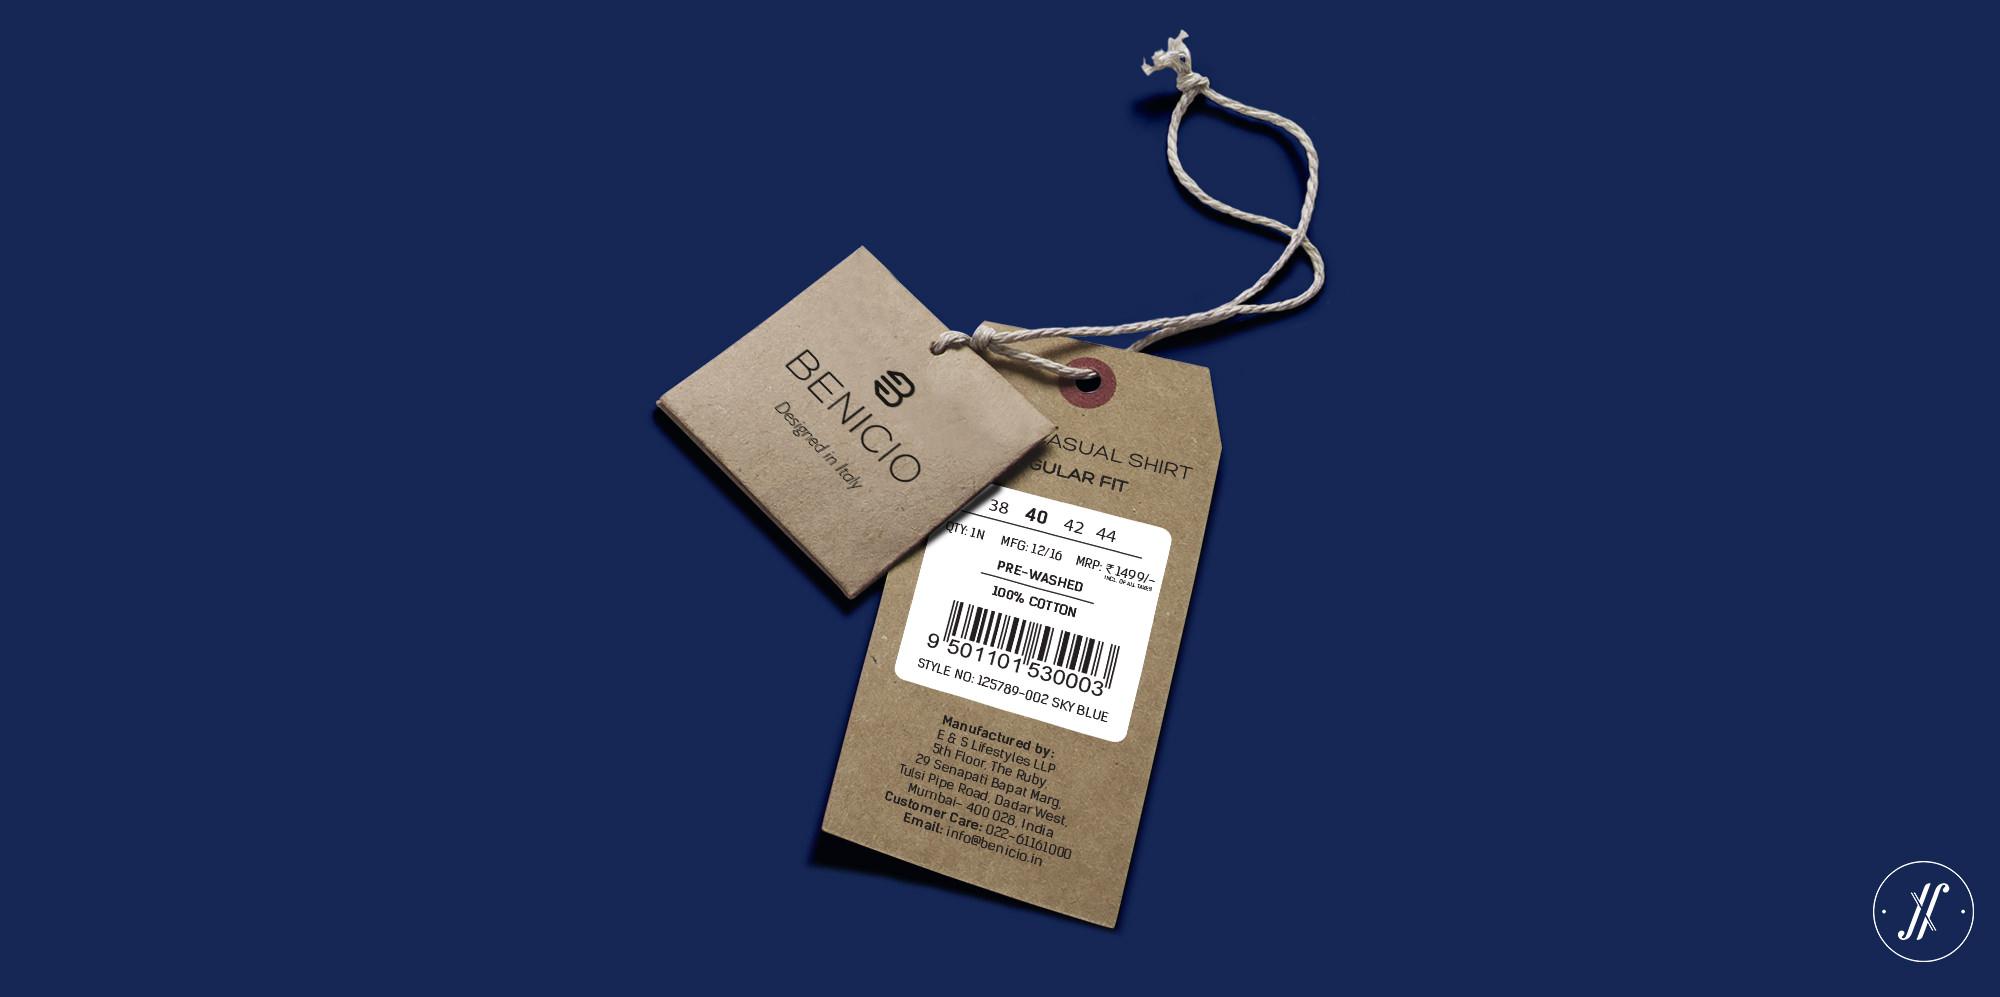 Yellow Fishes YF Branding Agency Mumbai India Menswear Brand Apparel Branding Agency Benicio Brand Shirt Tag Design